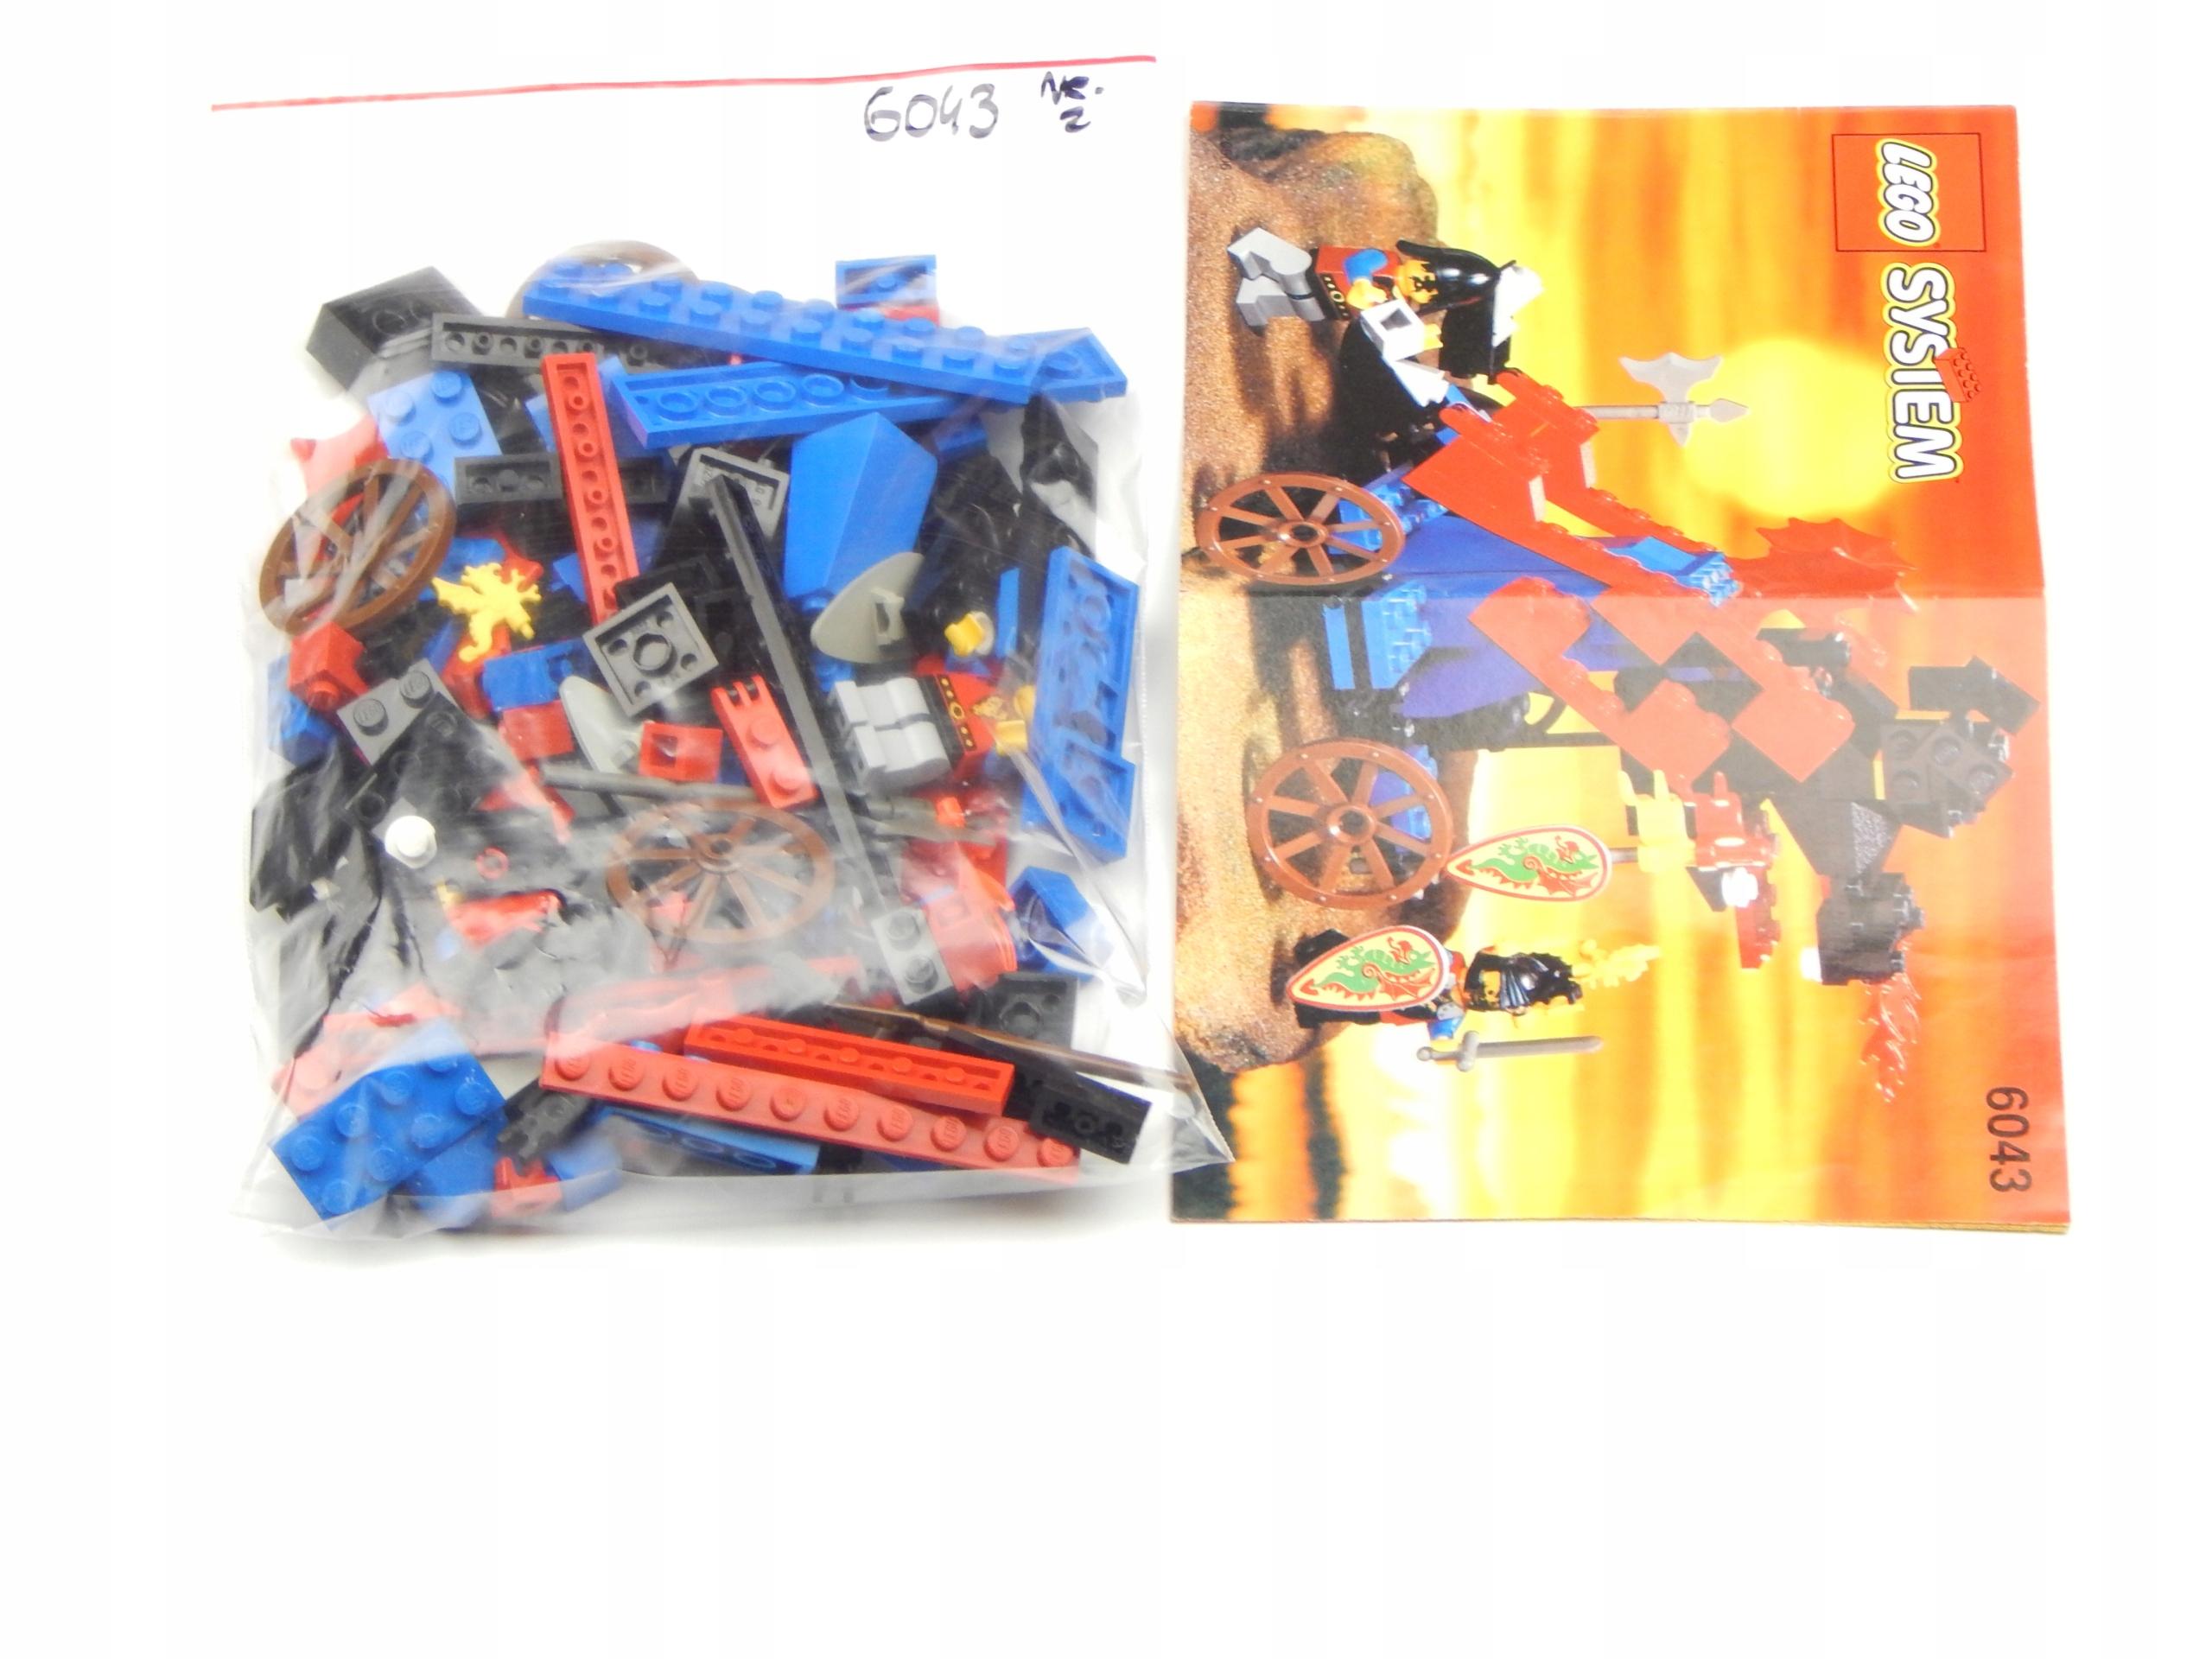 LEGO SET 6043 CASTLE INSTRUKCJA UNIKAT SUPER STAN